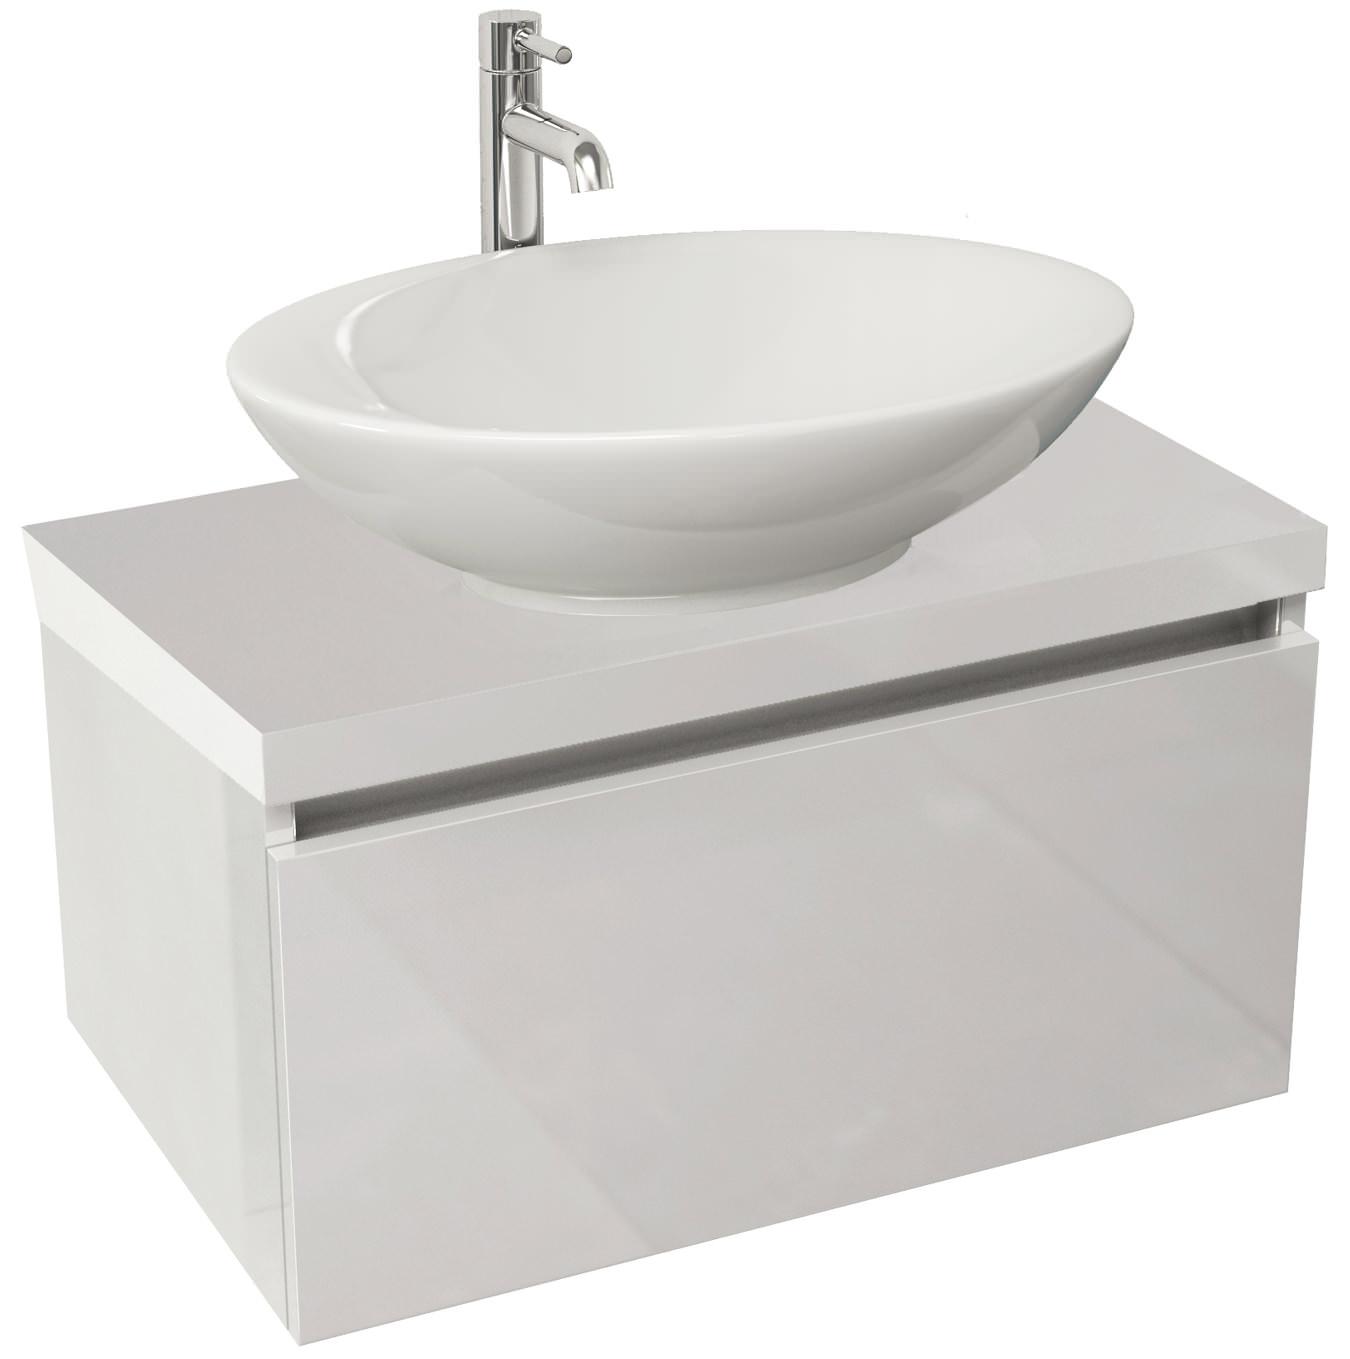 Wall Hung Bathroom Vanity Units / Starts from £42 / QS Supplies UK